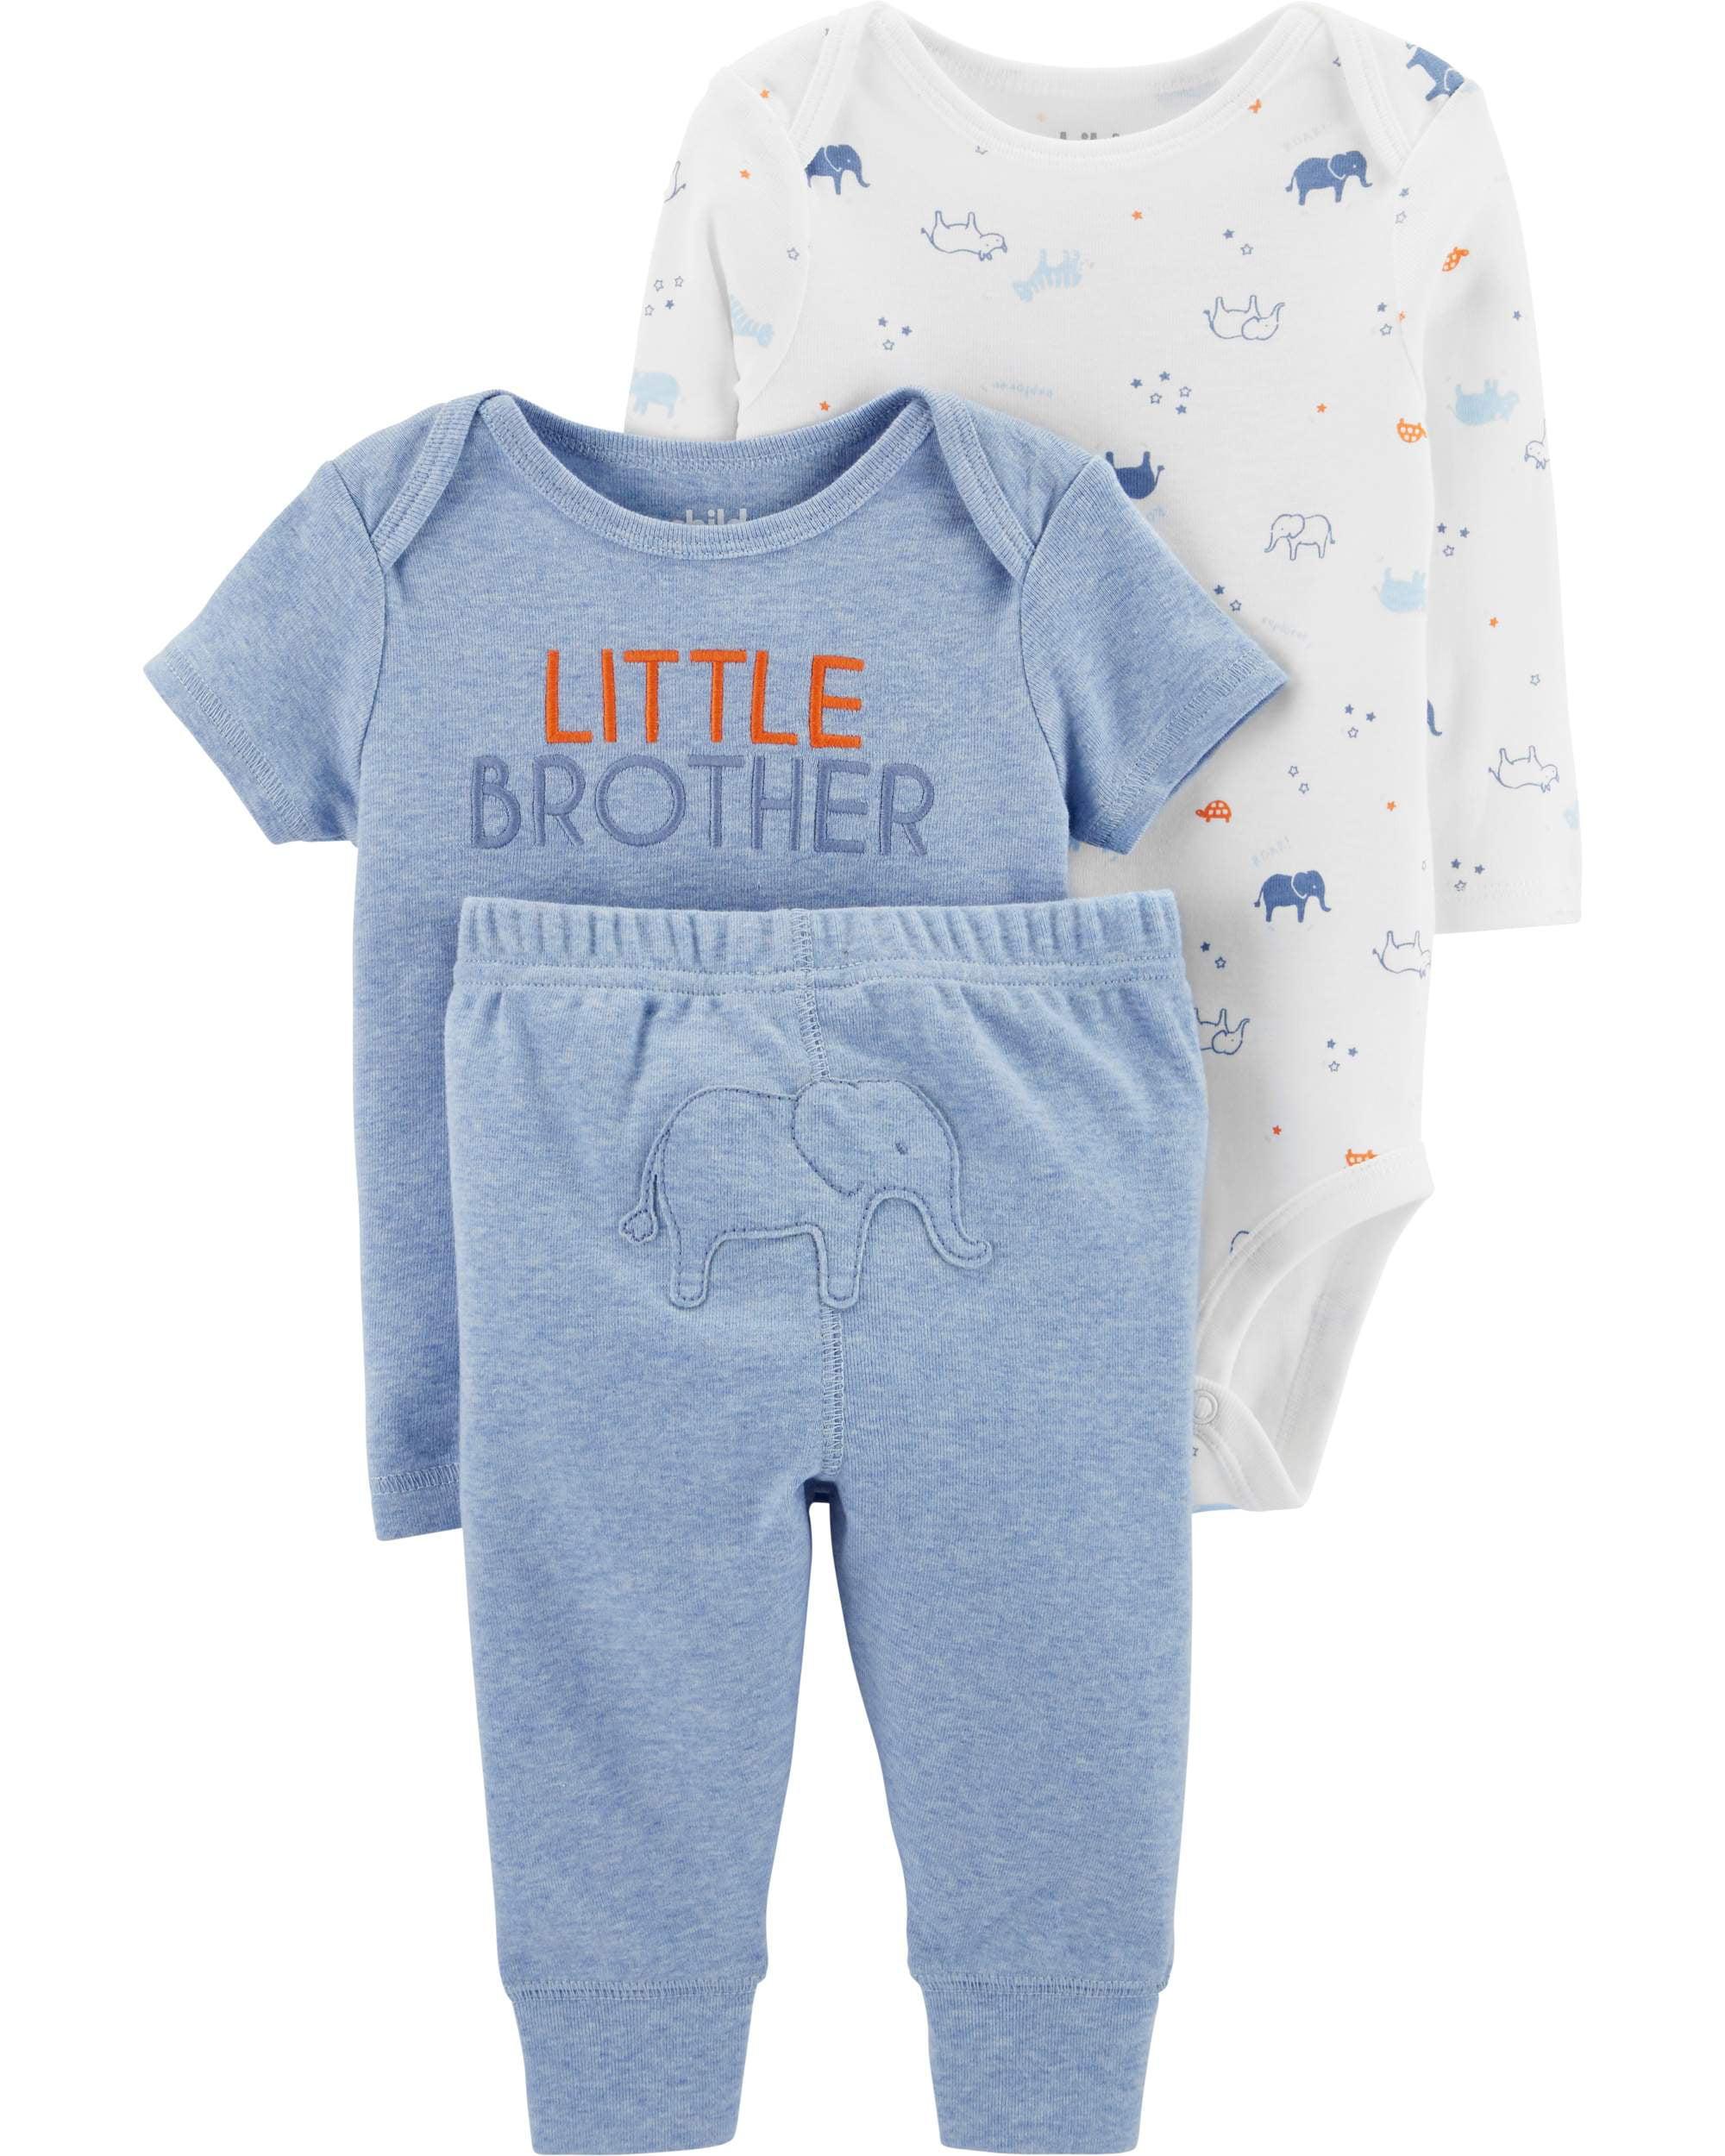 Long Sleeve Bodysuit, T-Shirt & Pants, 3pc Outfit Set (Baby Boys)